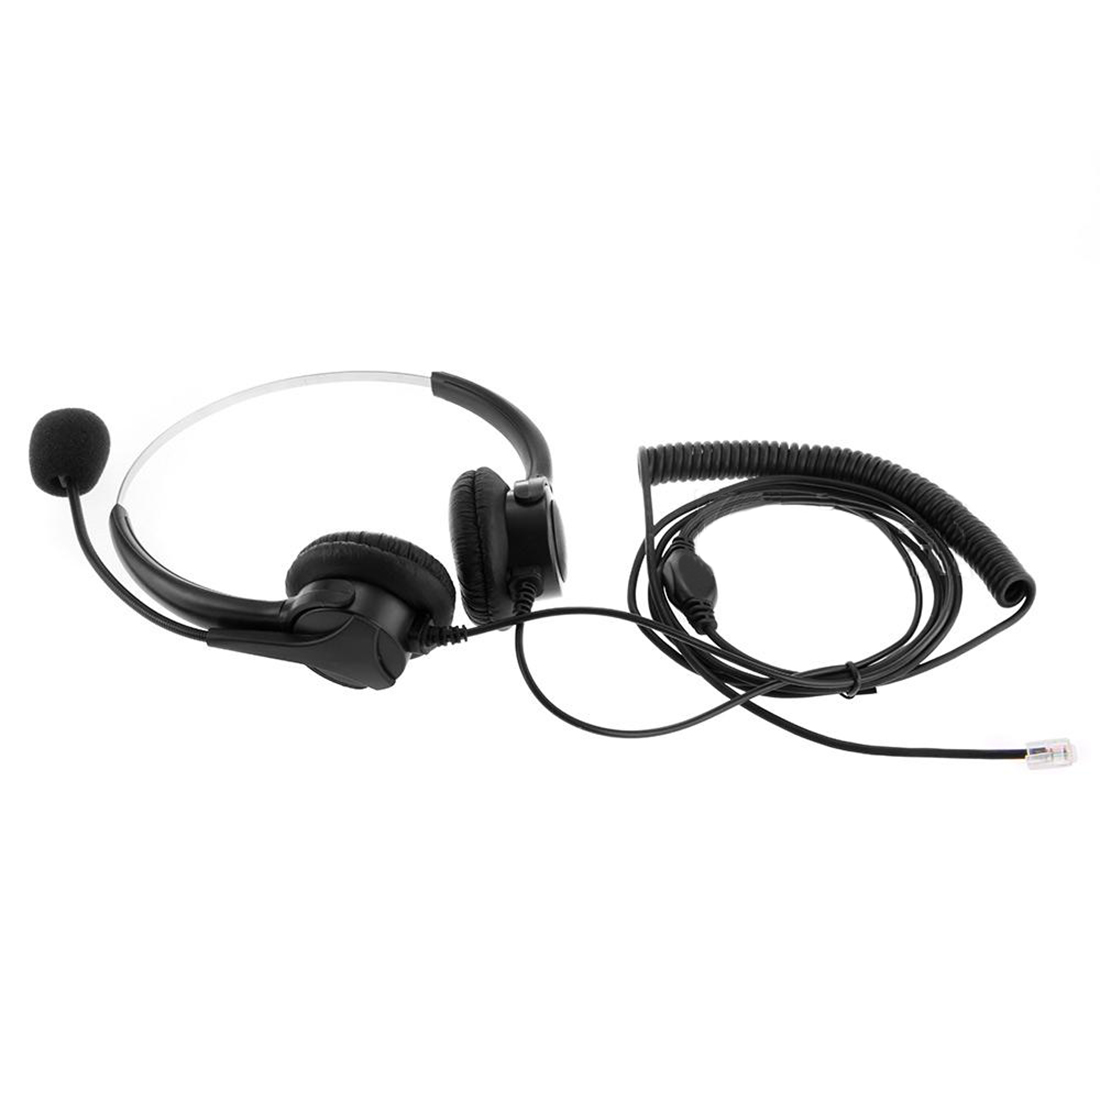 Marsnaska Brand New 4-Pin Call Center Corded Operator Telephone Headset High Quality Headphones with Microphone